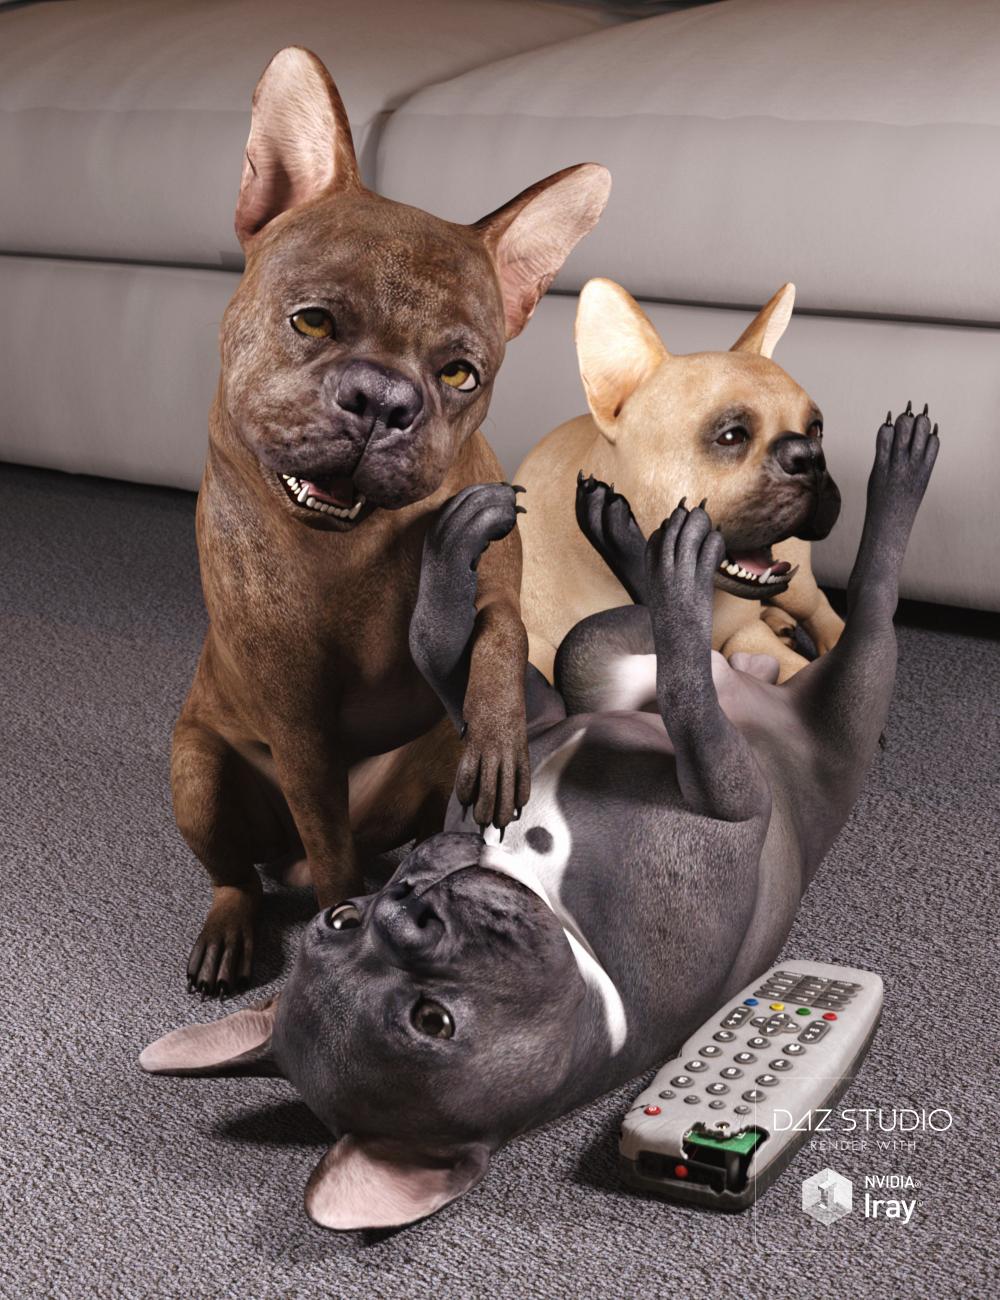 French Bulldog for Daz Dog 8 by: , 3D Models by Daz 3D